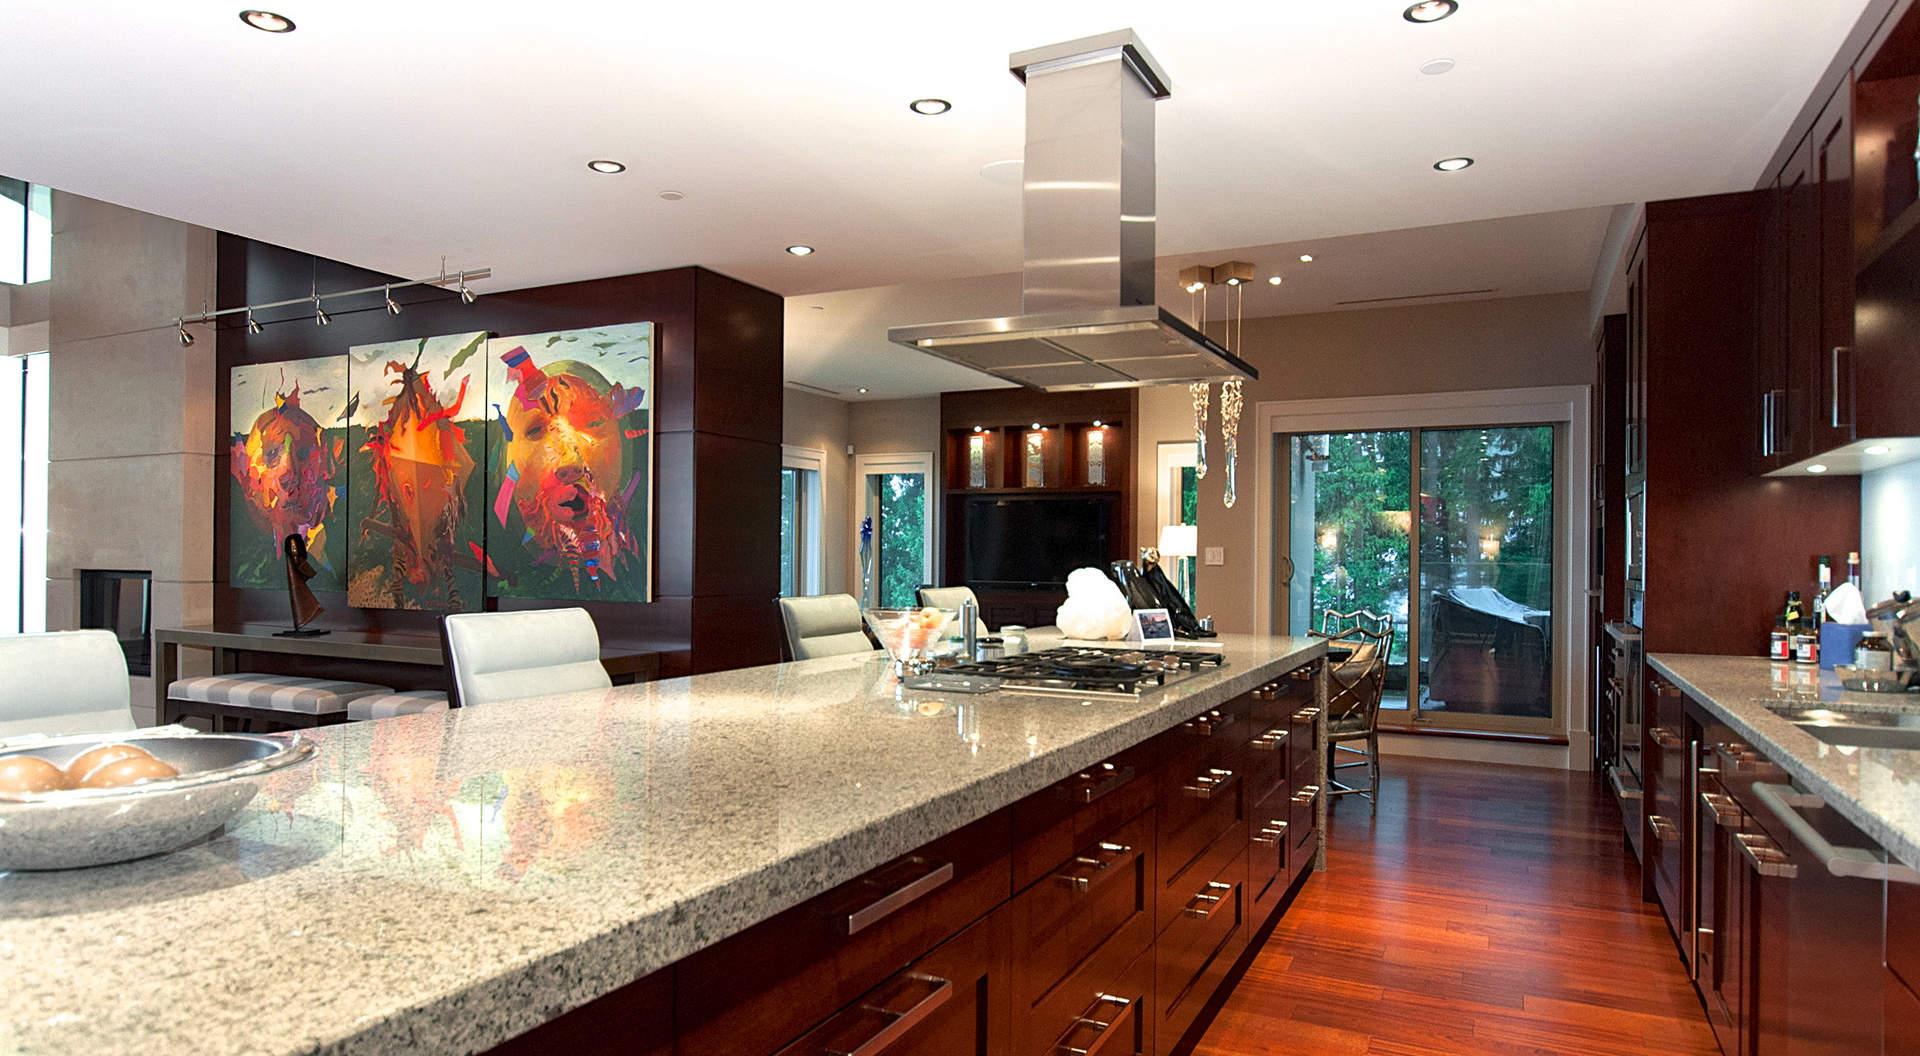 Penthouse Kitchen 2 Interior Design Ideas